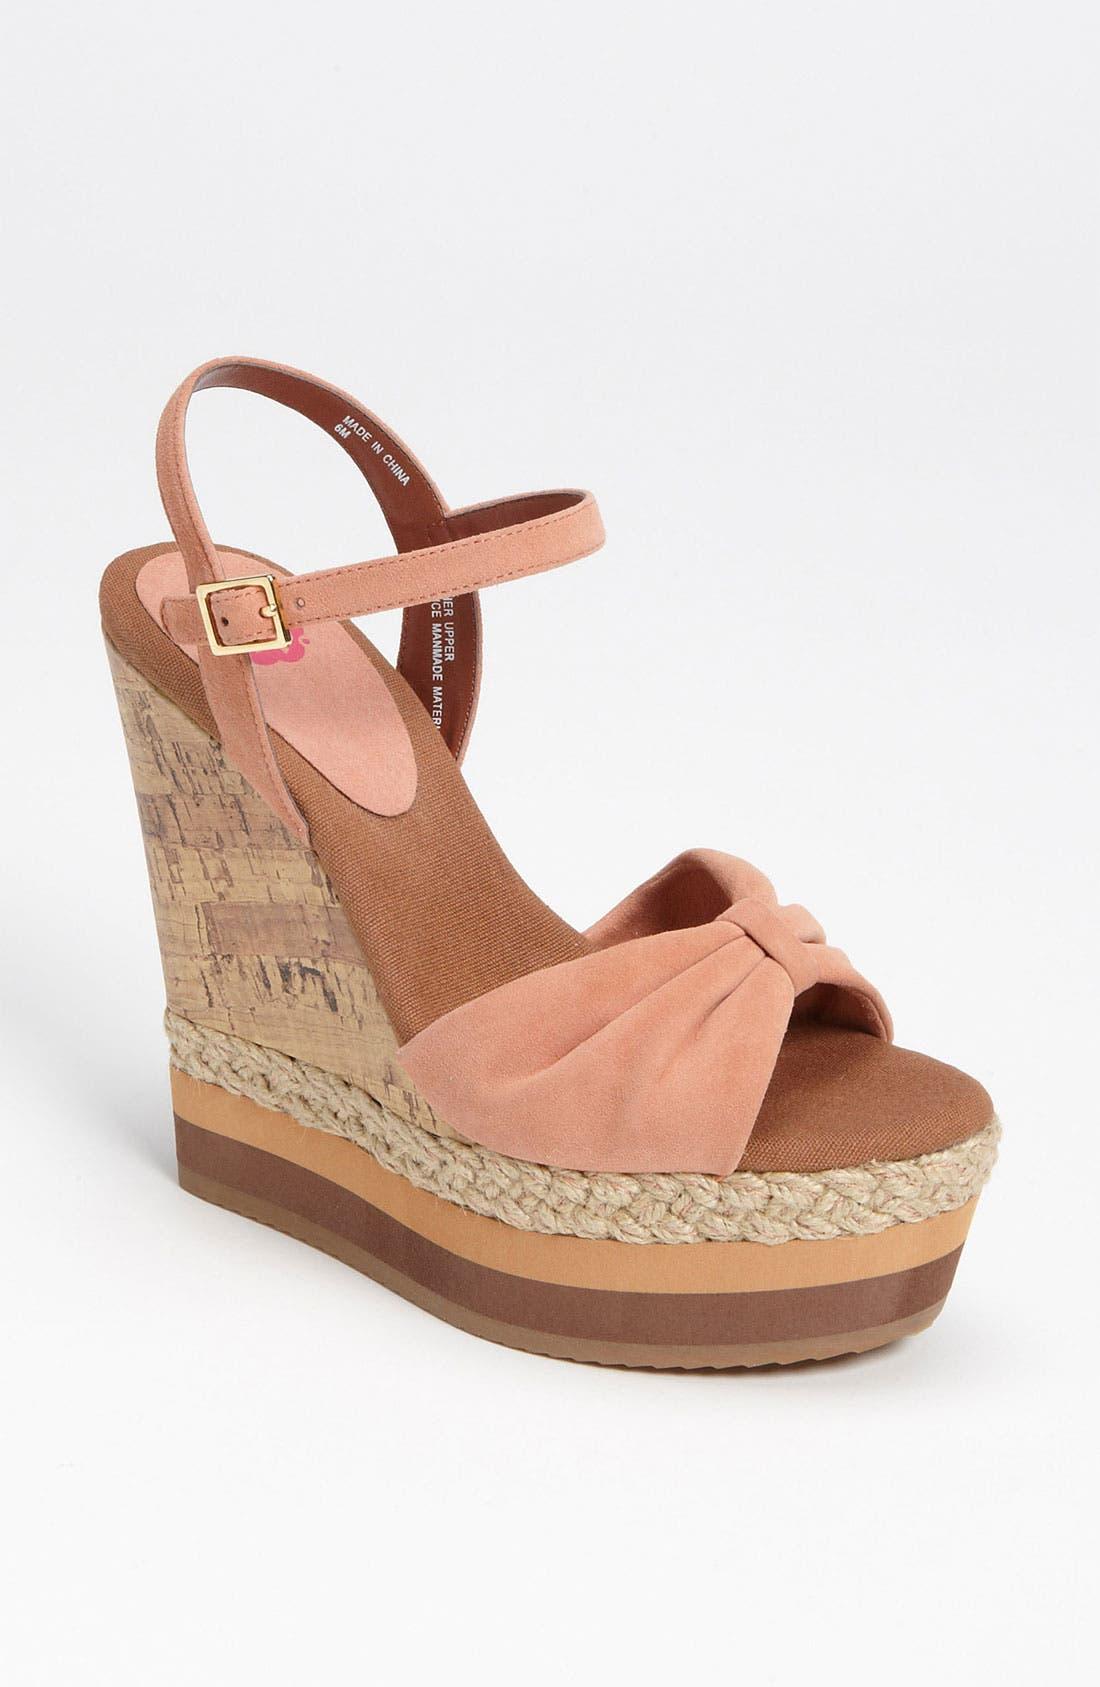 Alternate Image 1 Selected - BP 'Calypso' Wedge Sandal